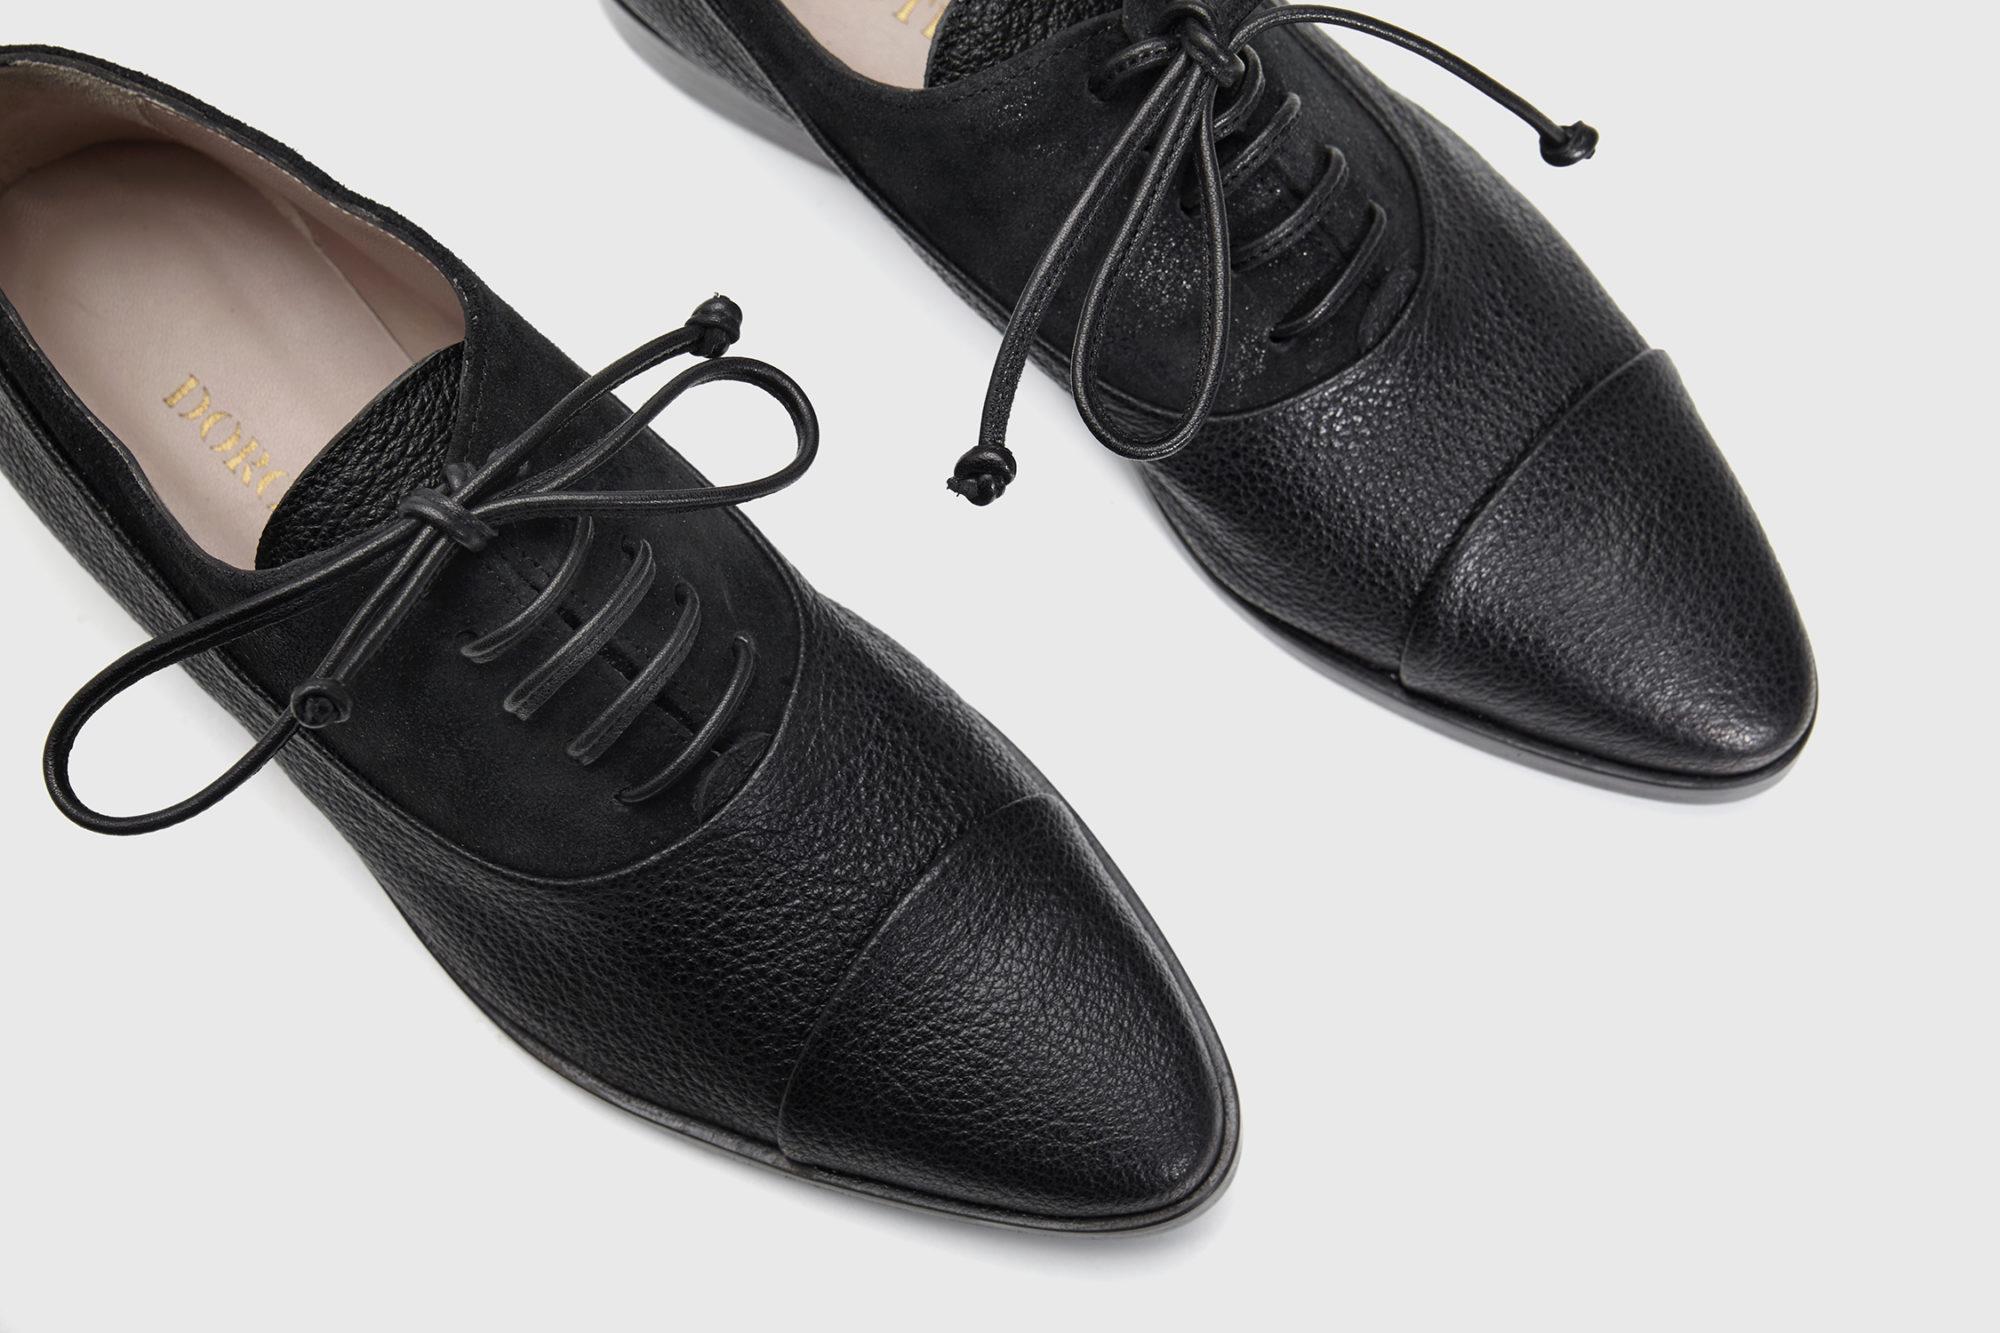 Dorotea Dorotea zapato de cordones Billie negro fw17 detalle